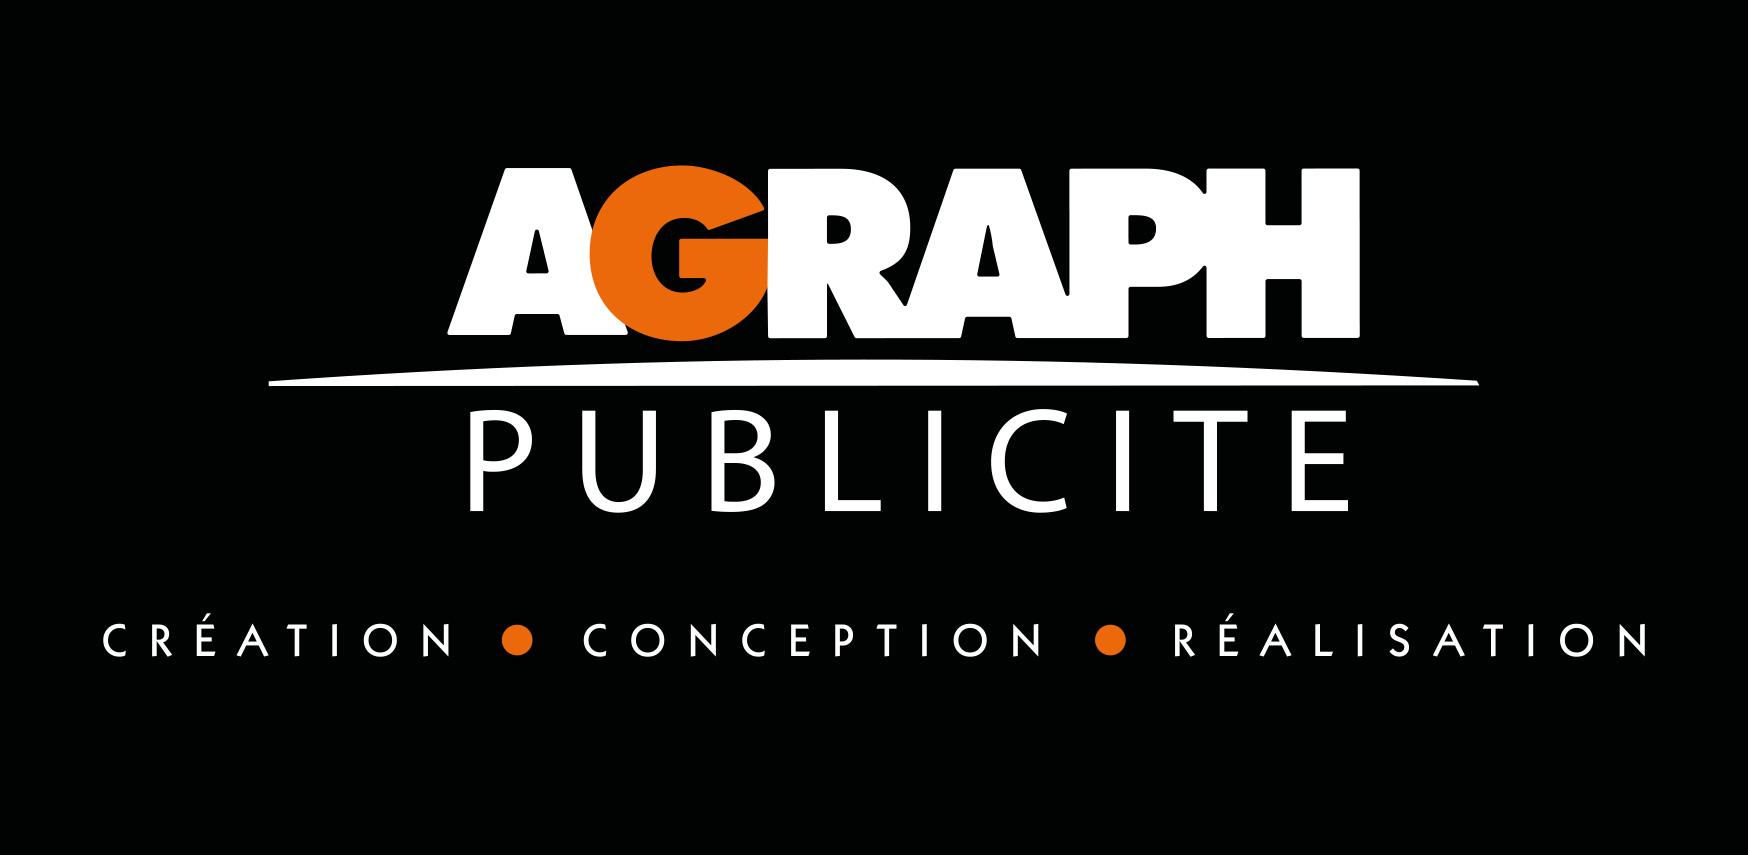 AGRAPH PUBLICITE